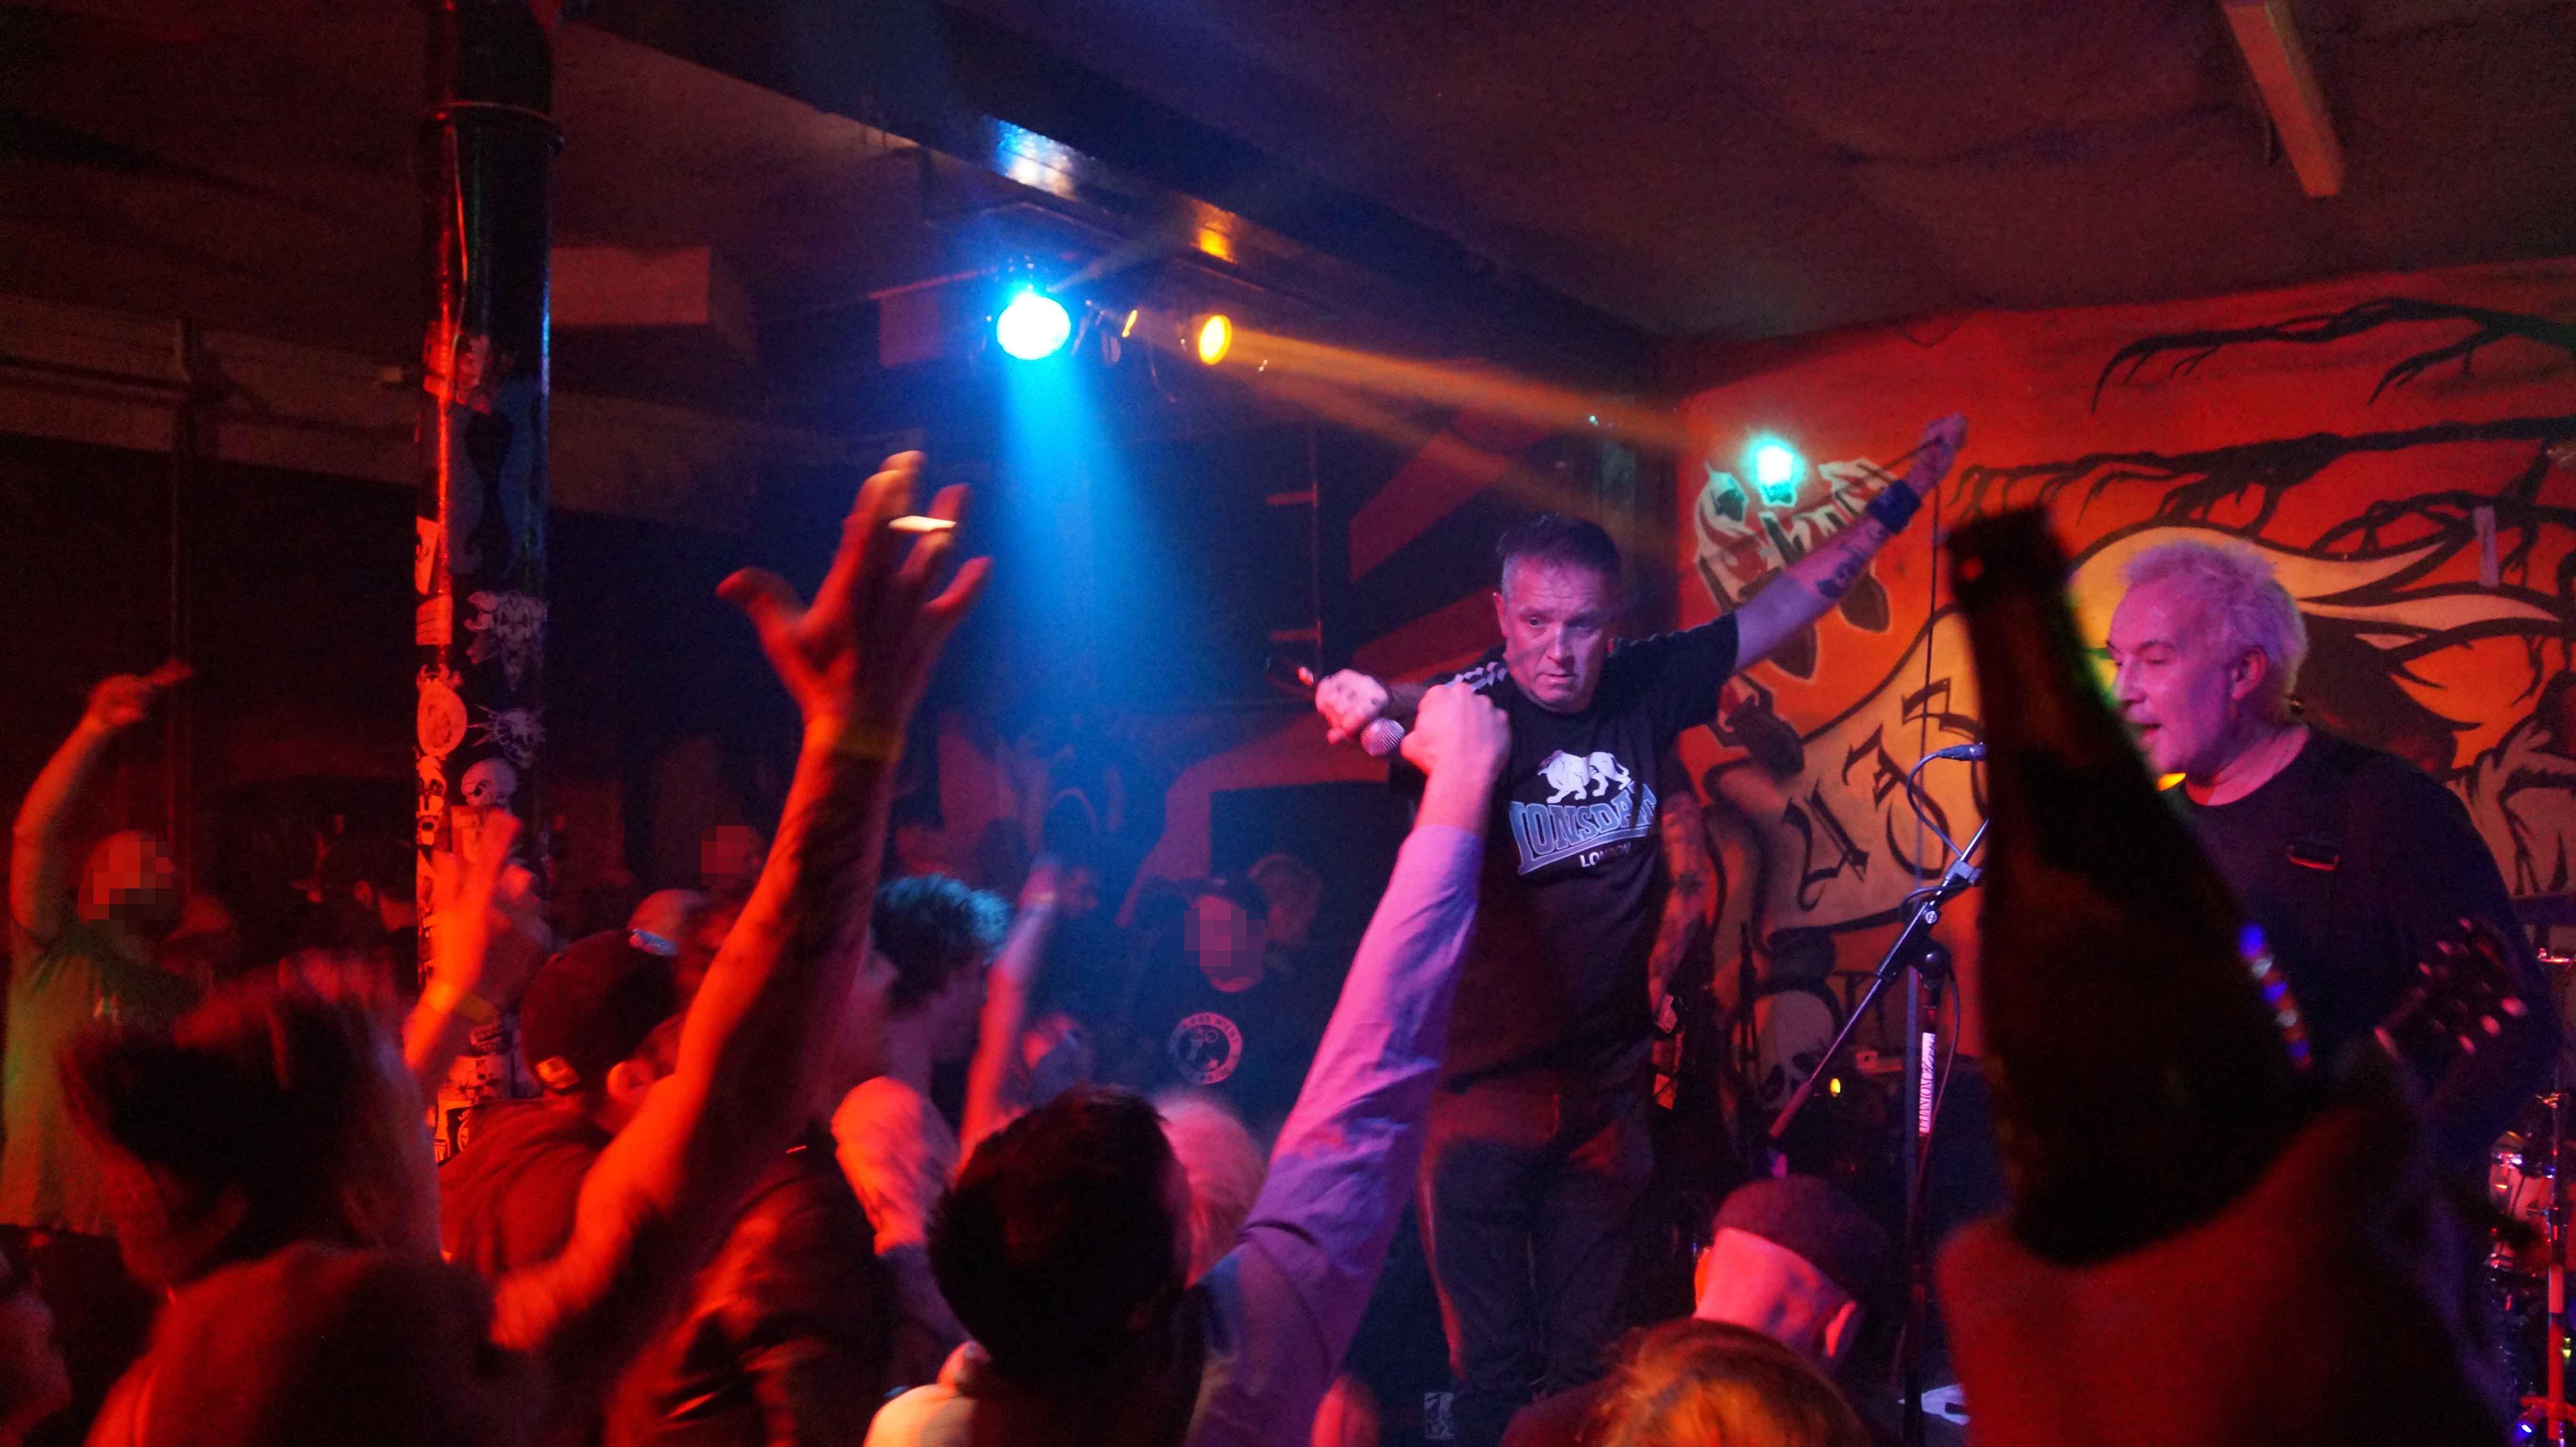 Sham 69 Punk Punkrock England Oi Skinhead 1975